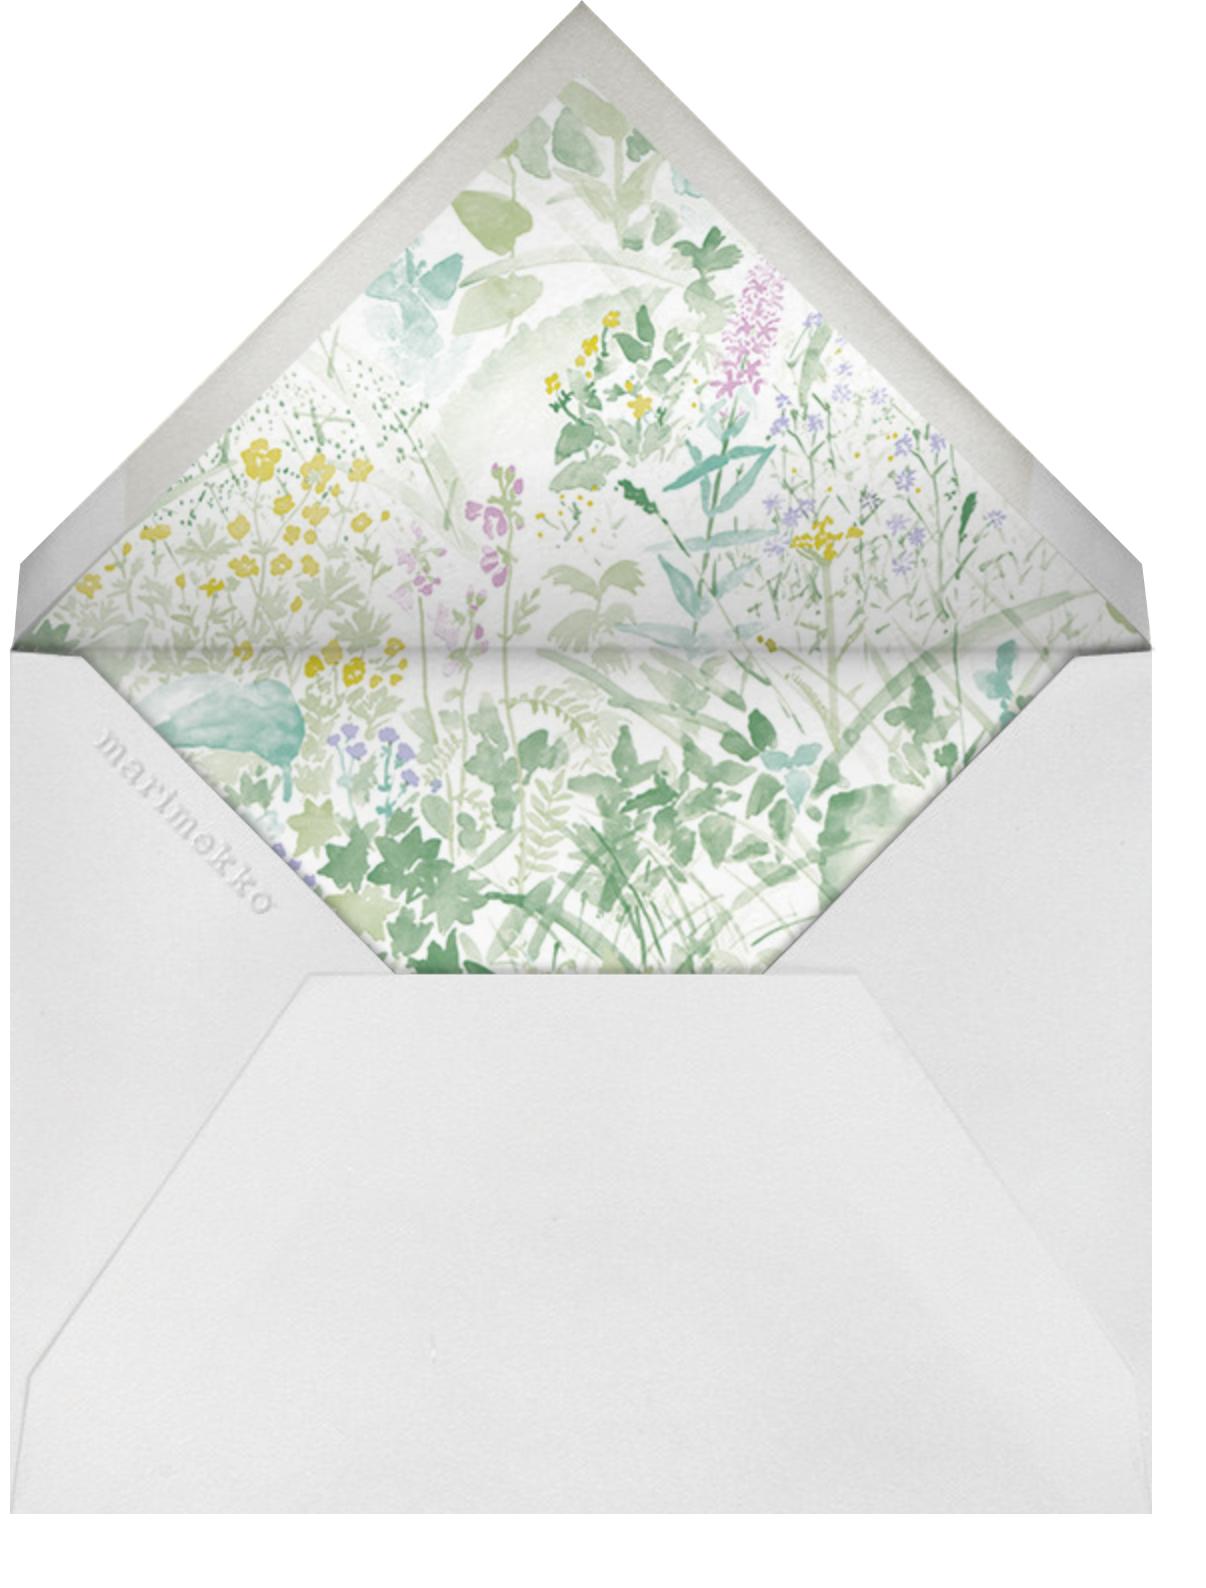 Kesanto (Tall) - Marimekko - Easter - envelope back